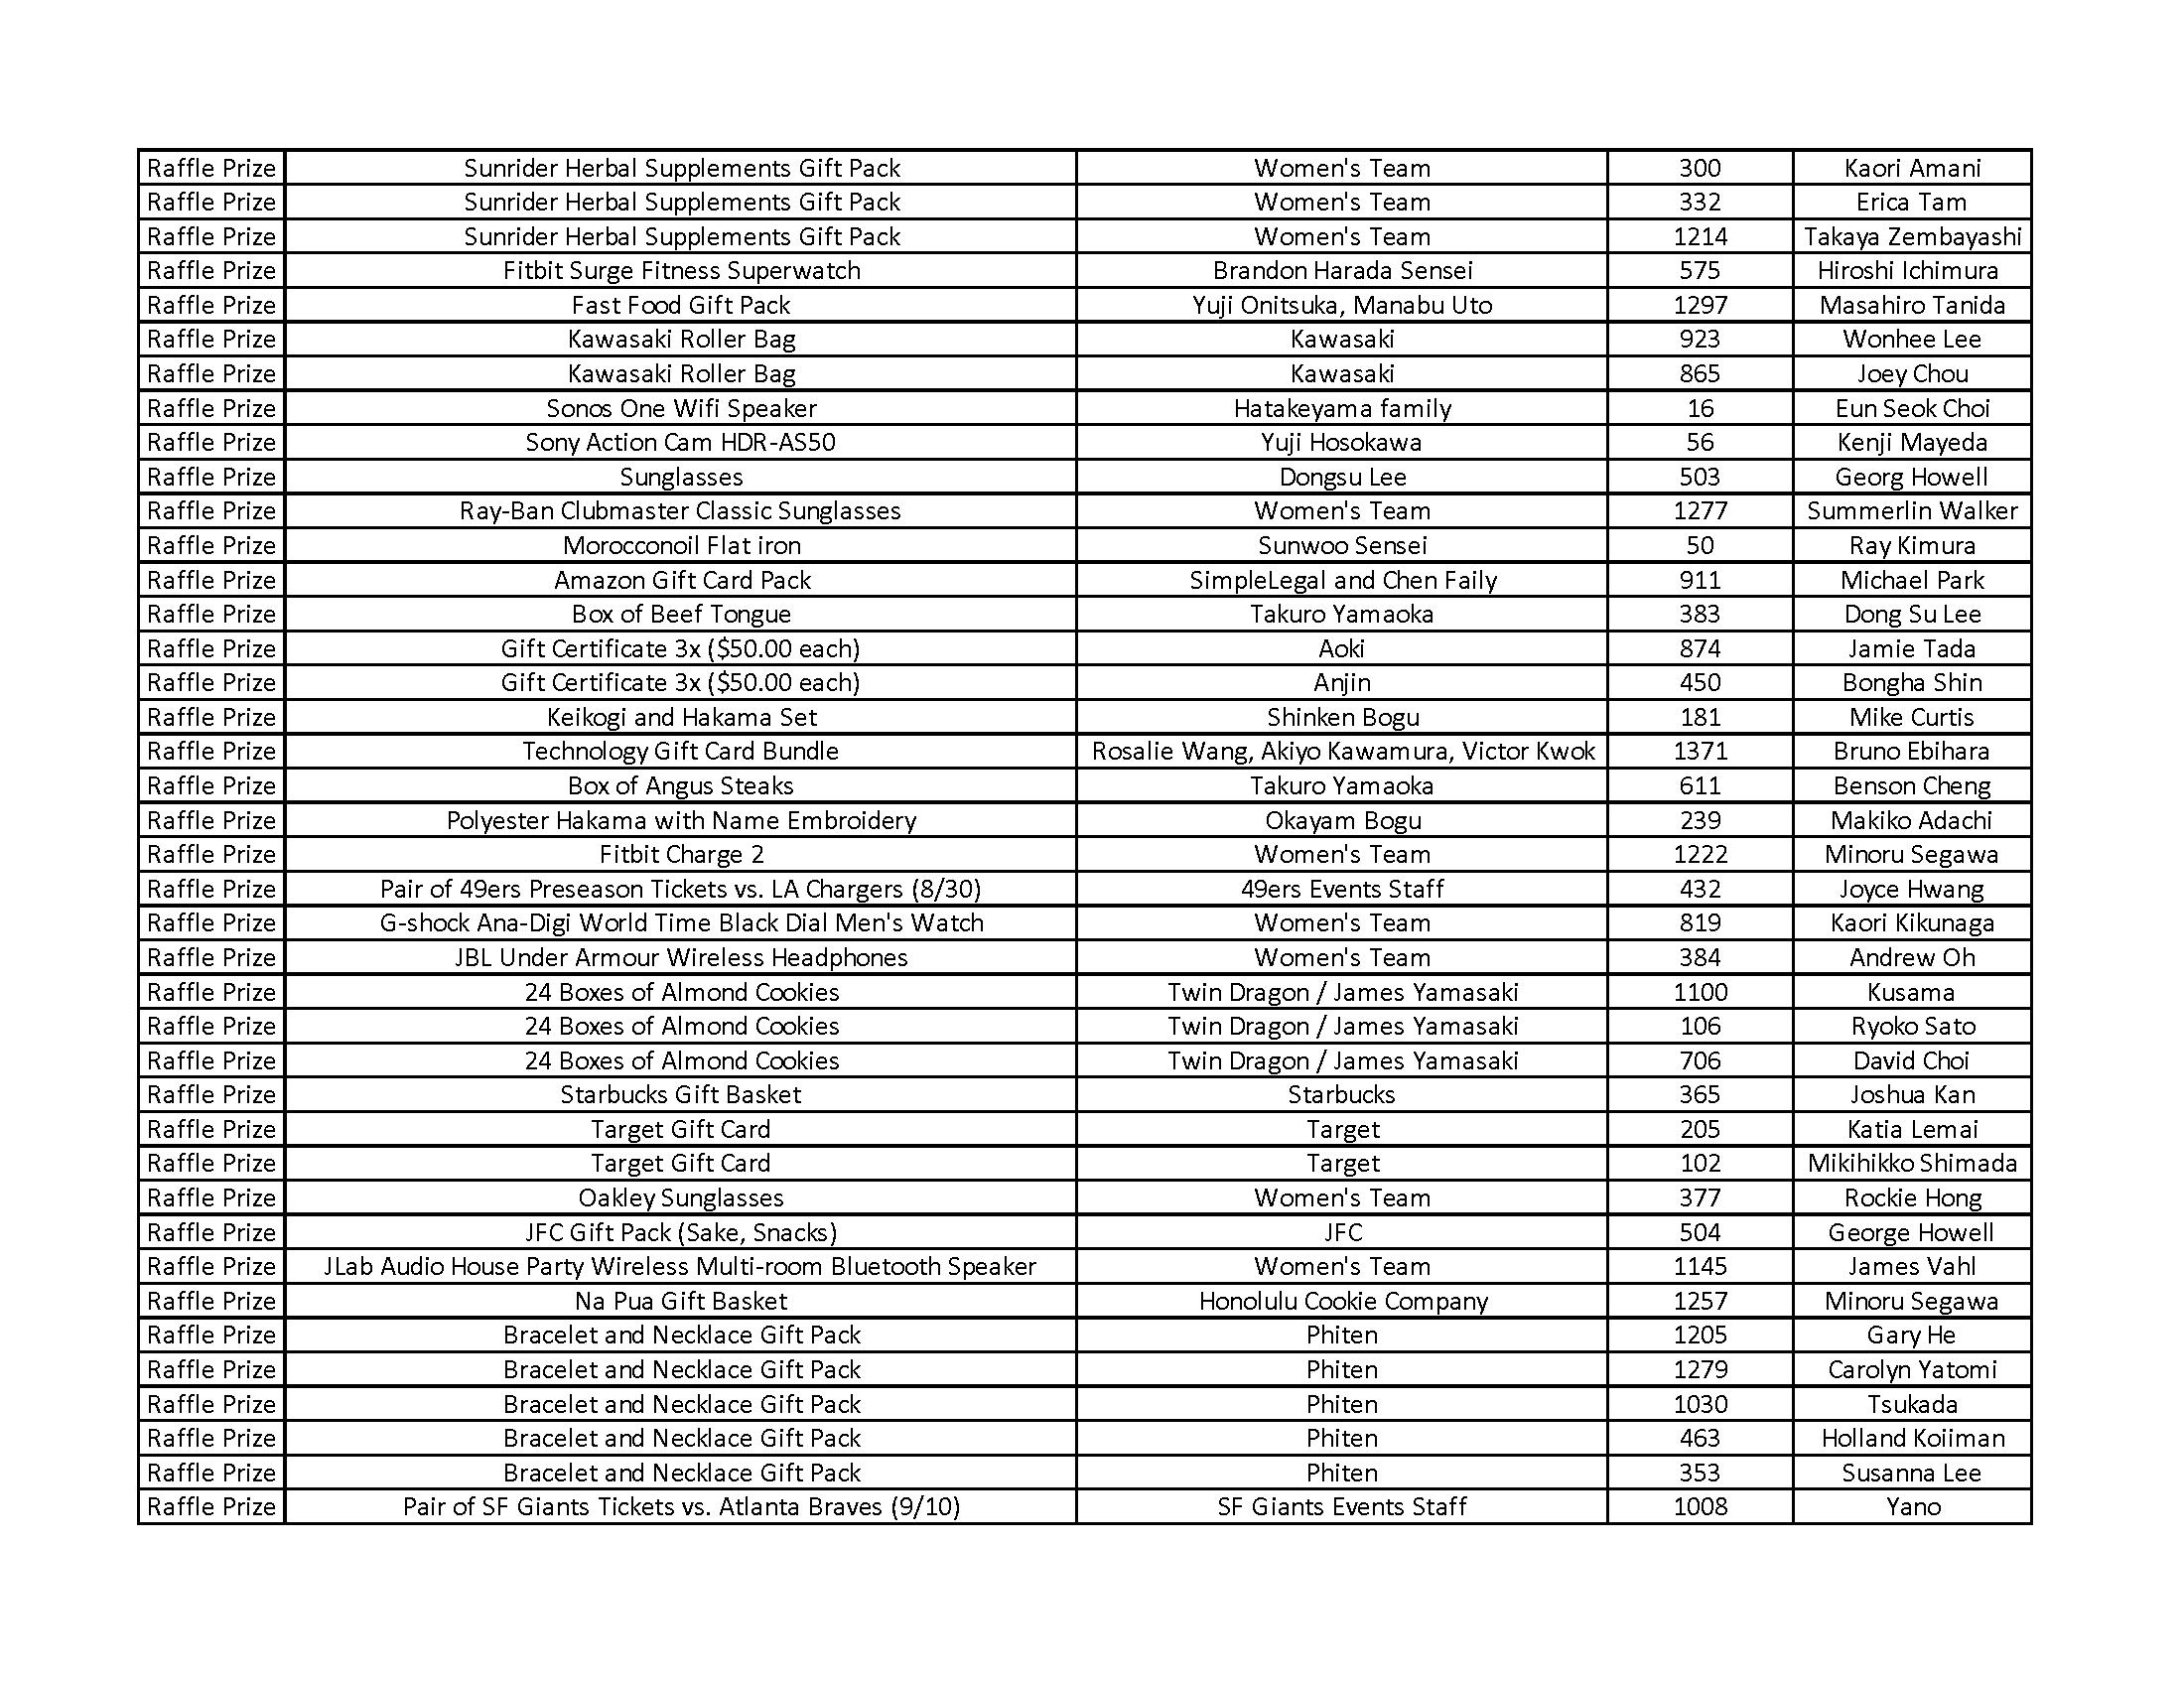 Raffle Prize Winners Final List_Page_2.png